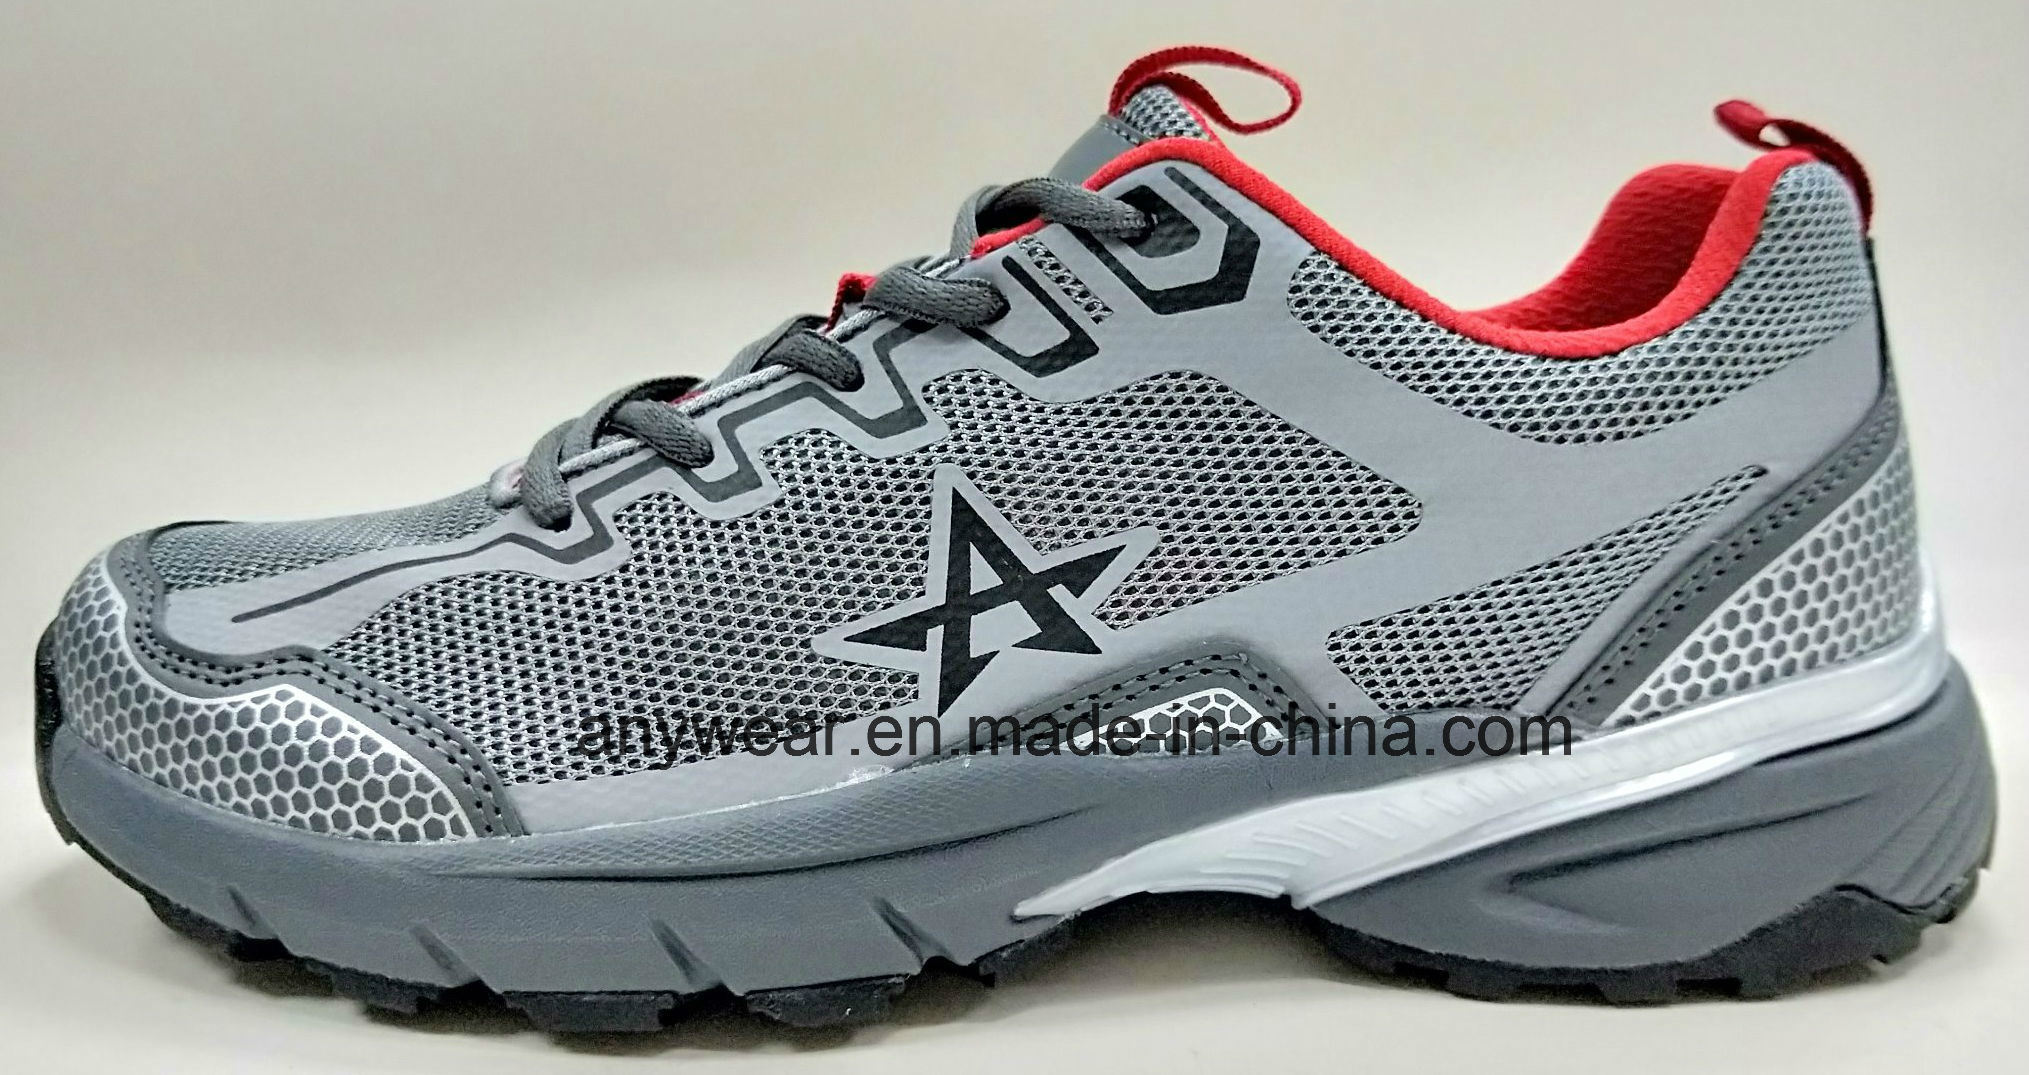 China Colorfull Men Outdoor Footwear